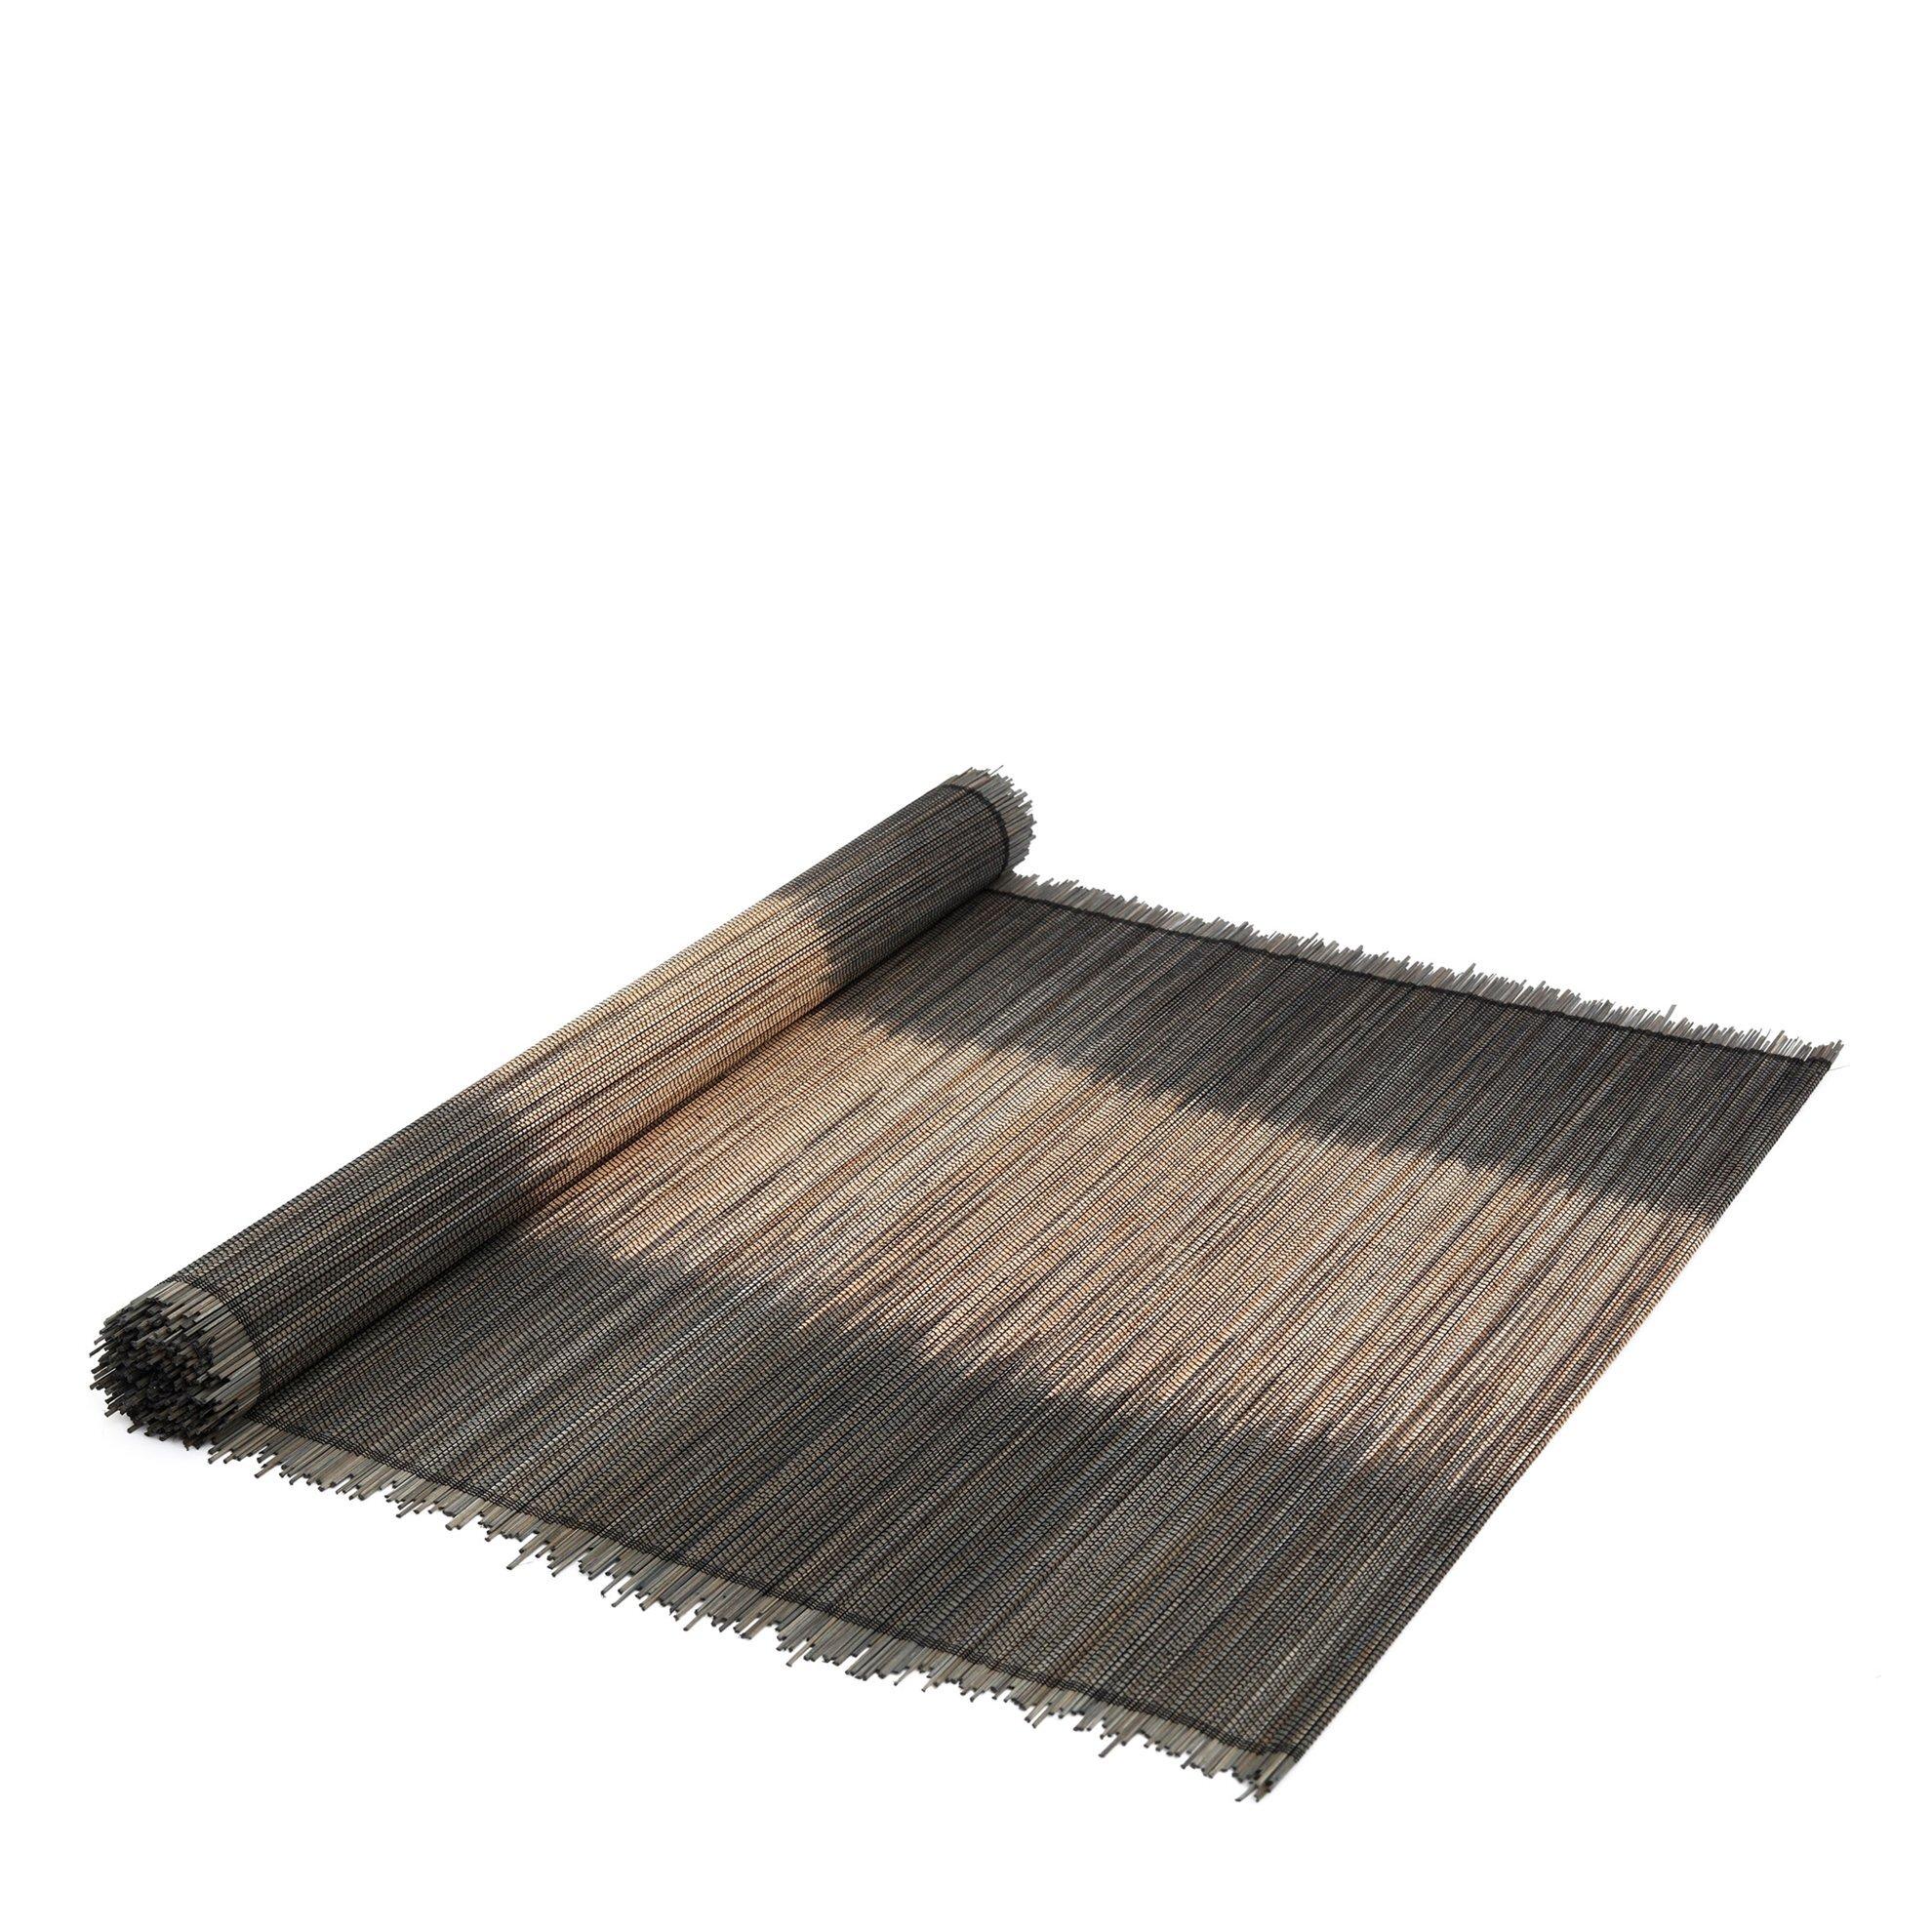 Bamboo Place Runner